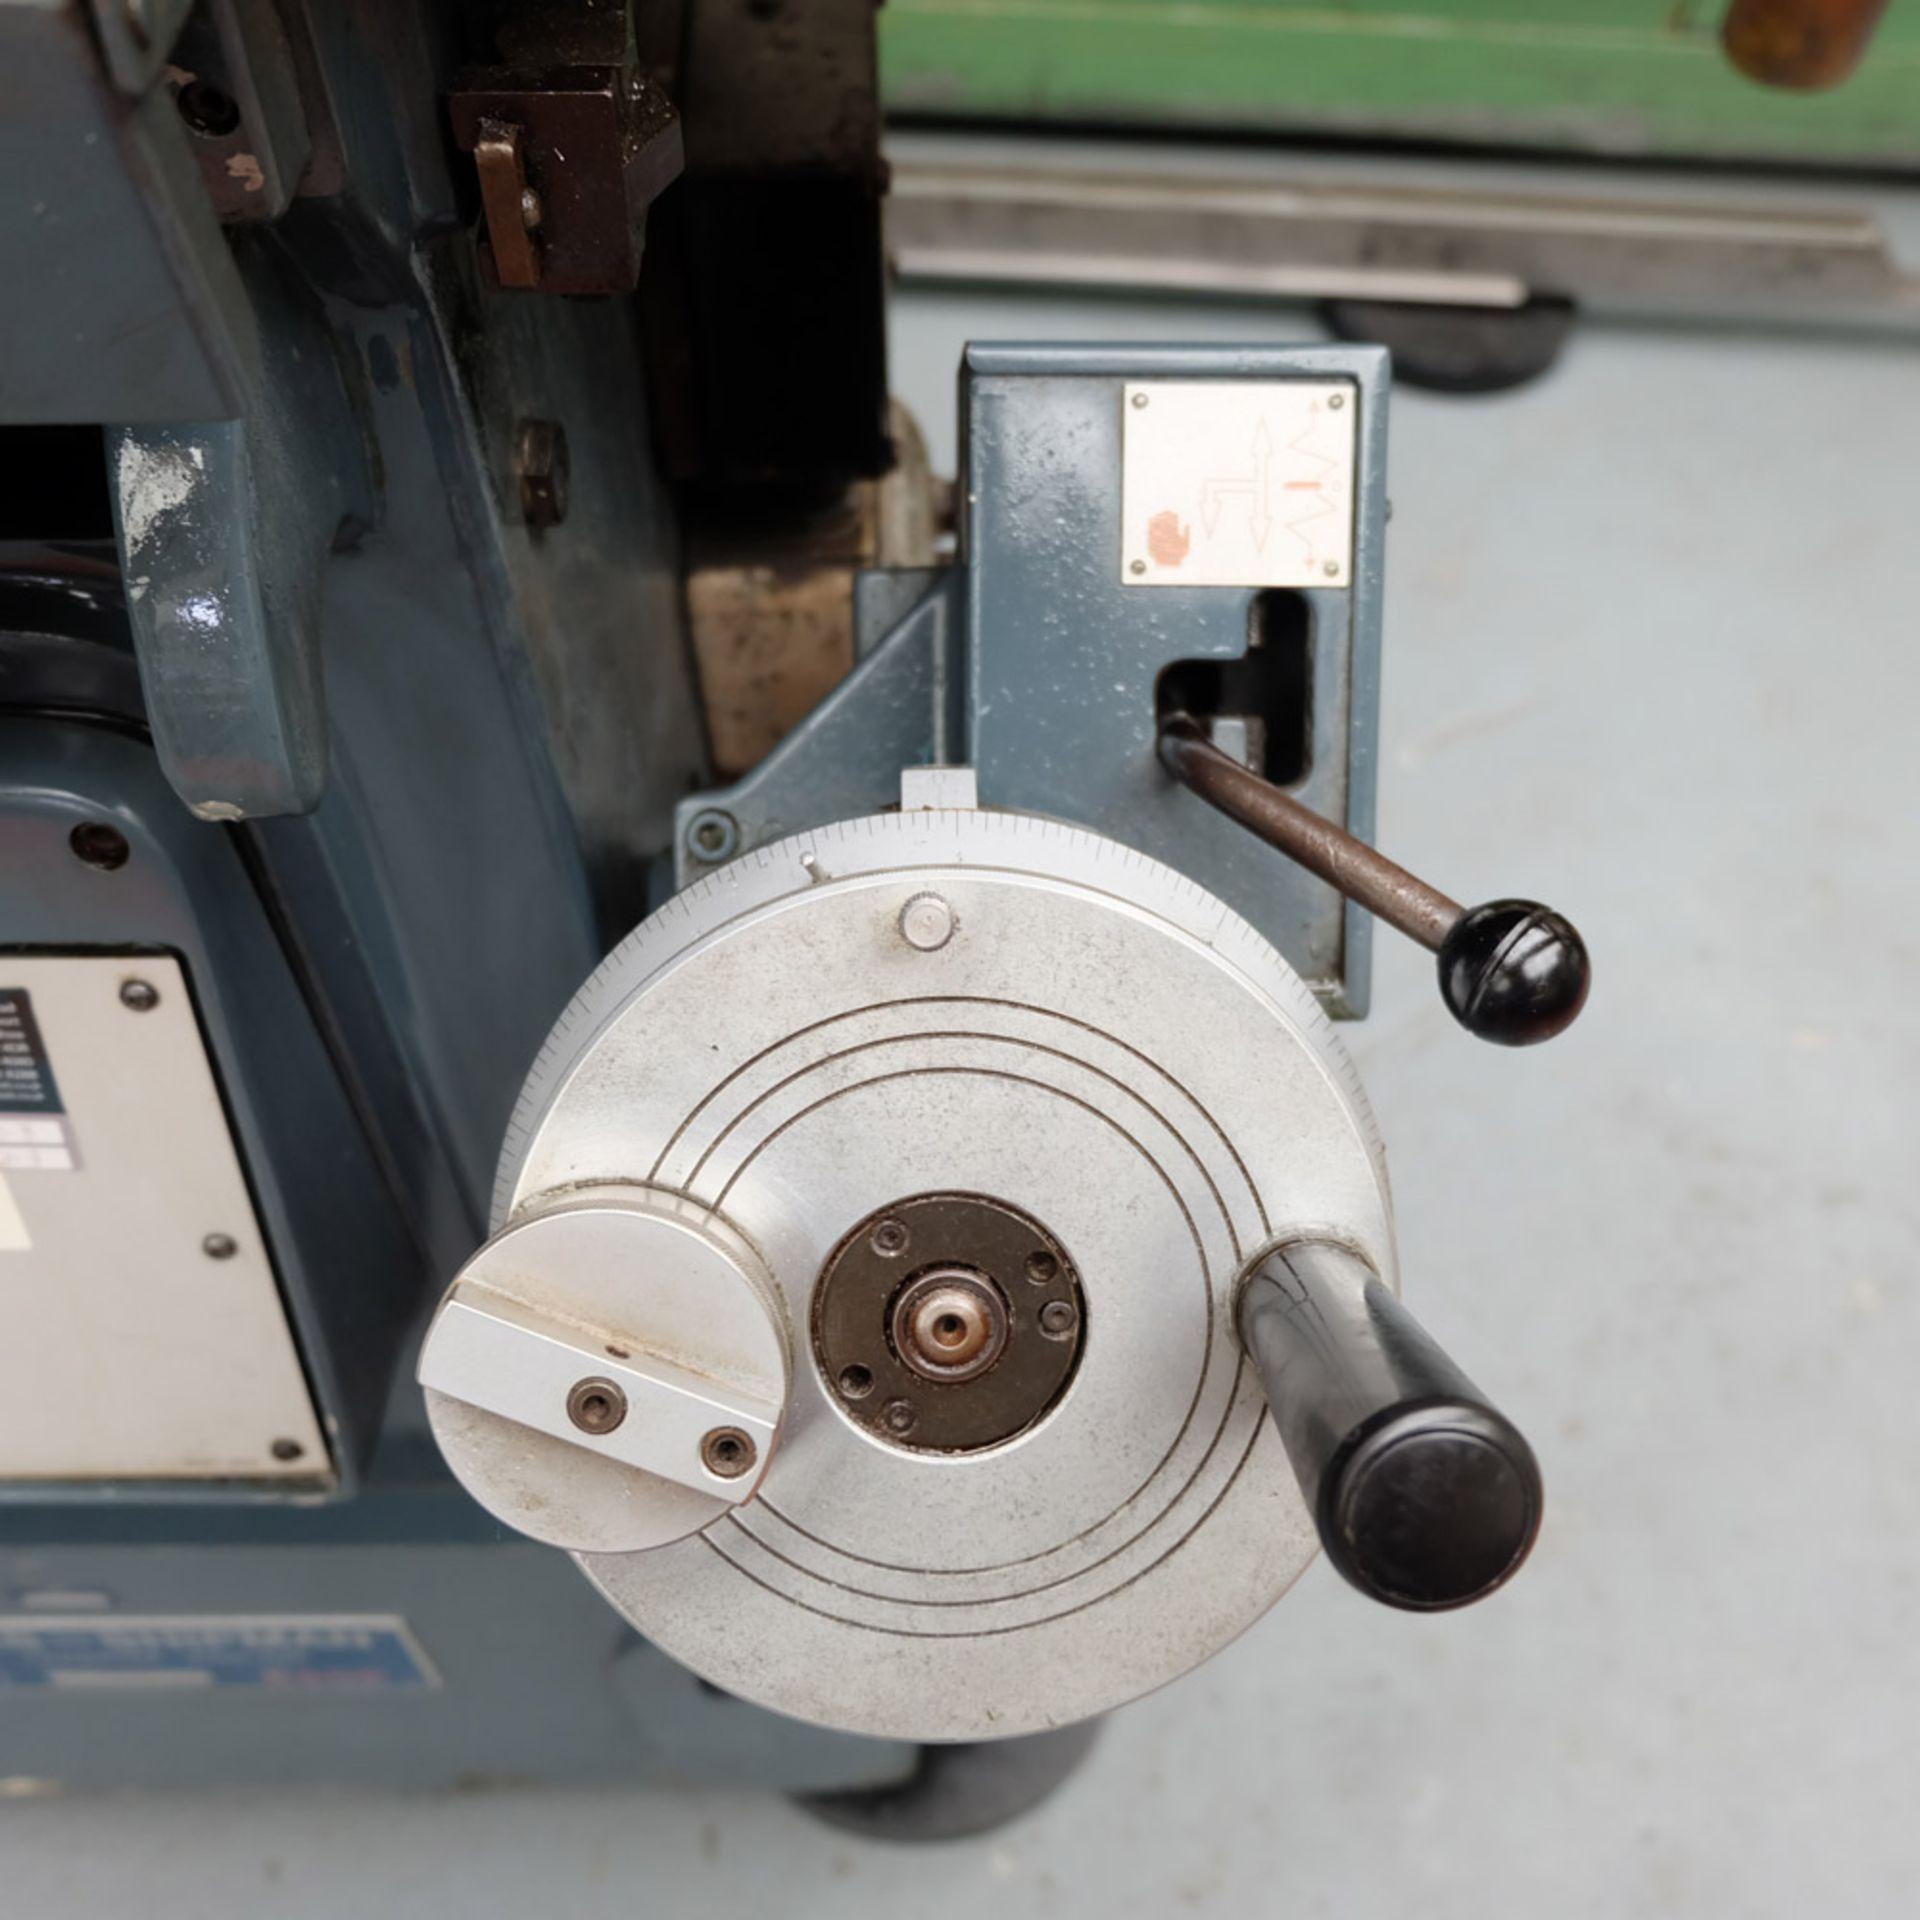 Jones & Shipman 540P Toolroom Surface Grinder. - Image 5 of 7